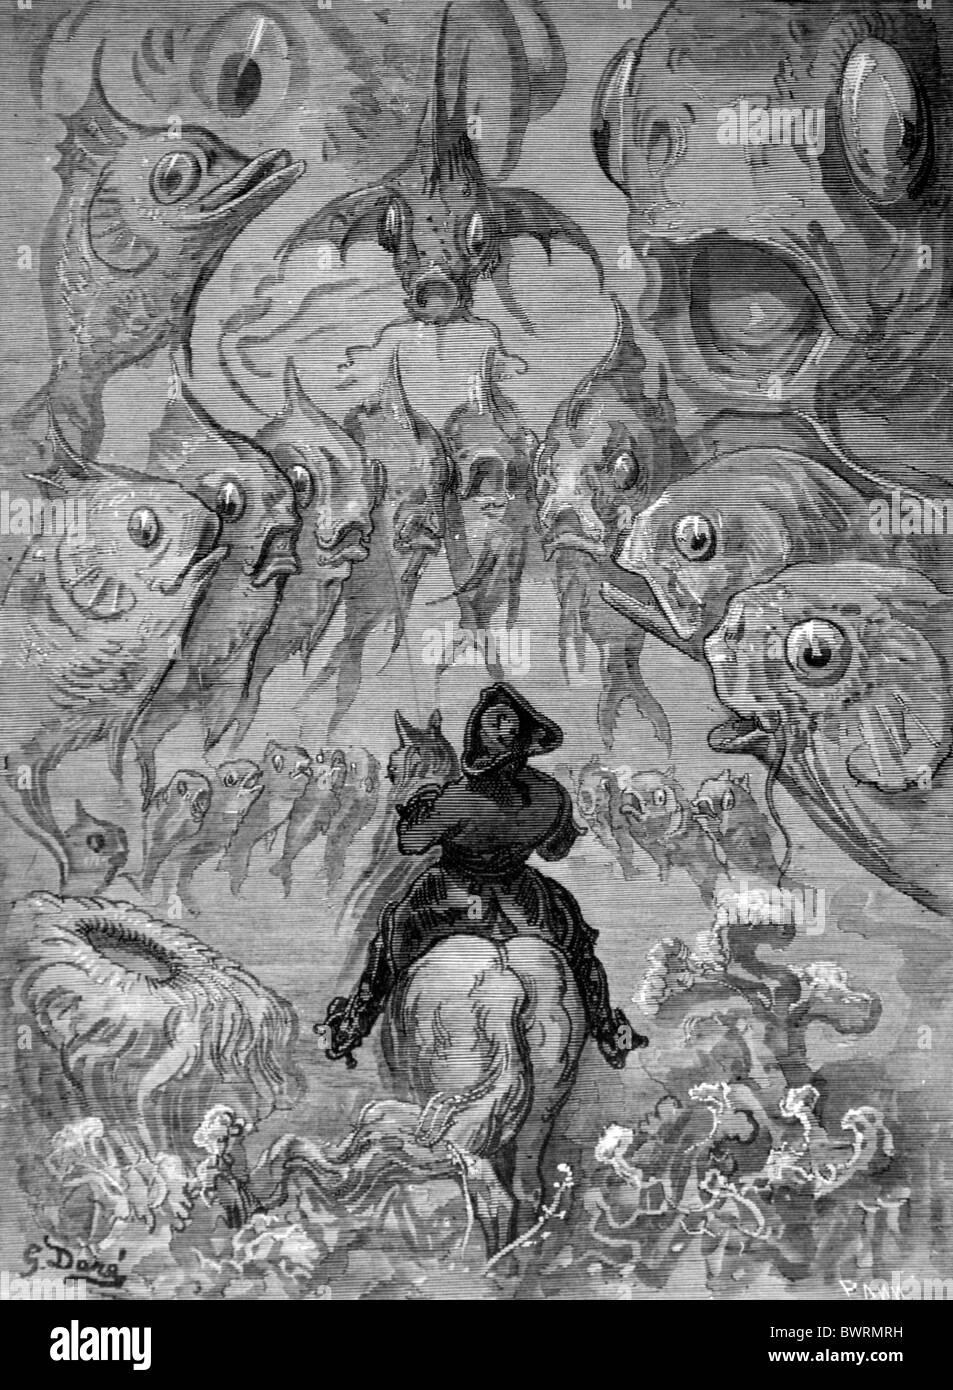 Gustave Doré; A Submarine World (Stories of Baron von Munchausen); Black and White Engraving - Stock Image